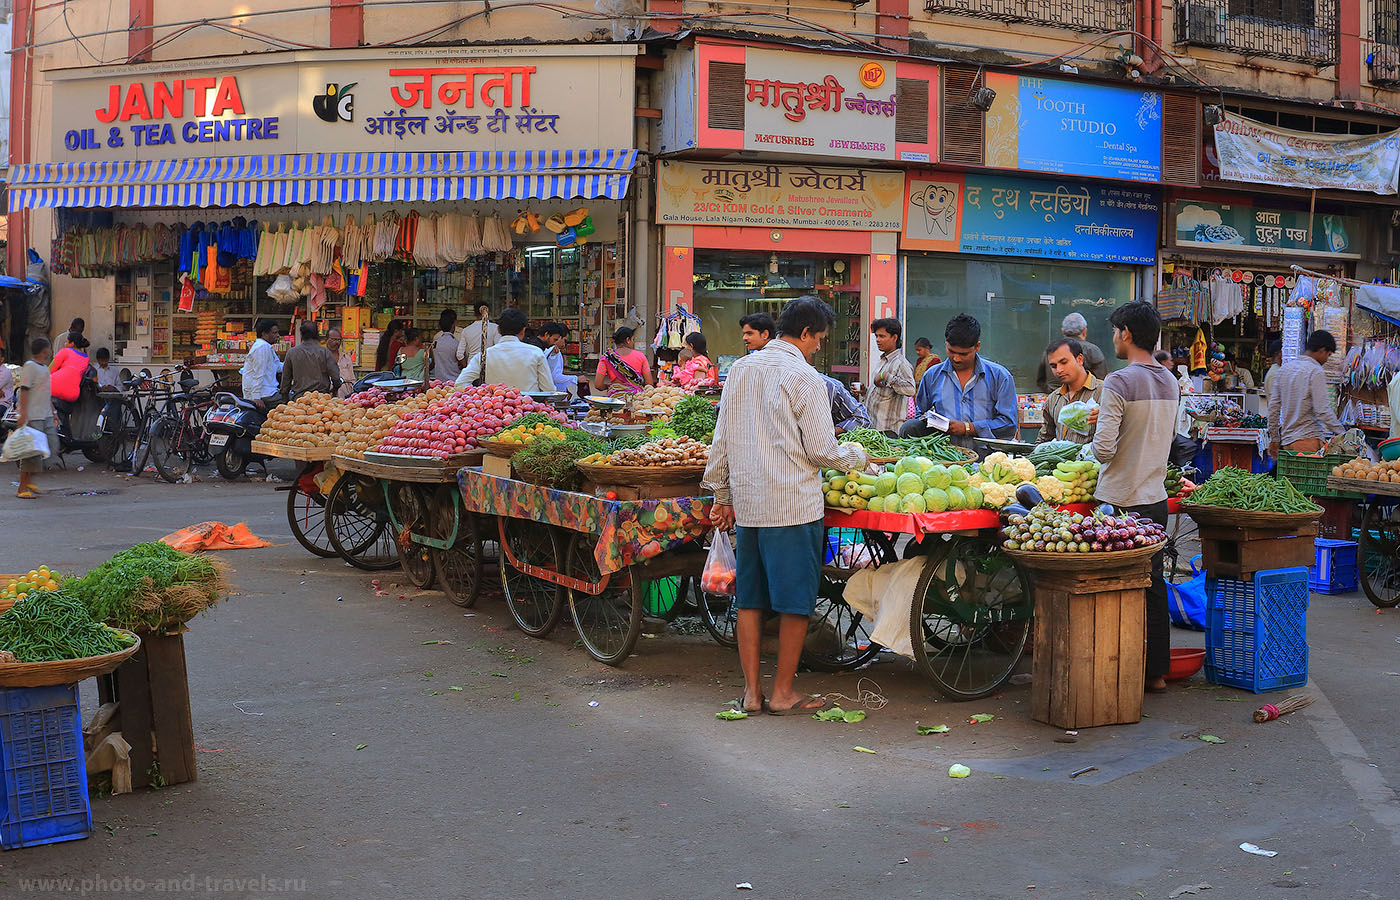 Фото 15. На рынке в Мумбаи (1/40, EV-1, f/14.0, ISO 500, ФР=40)